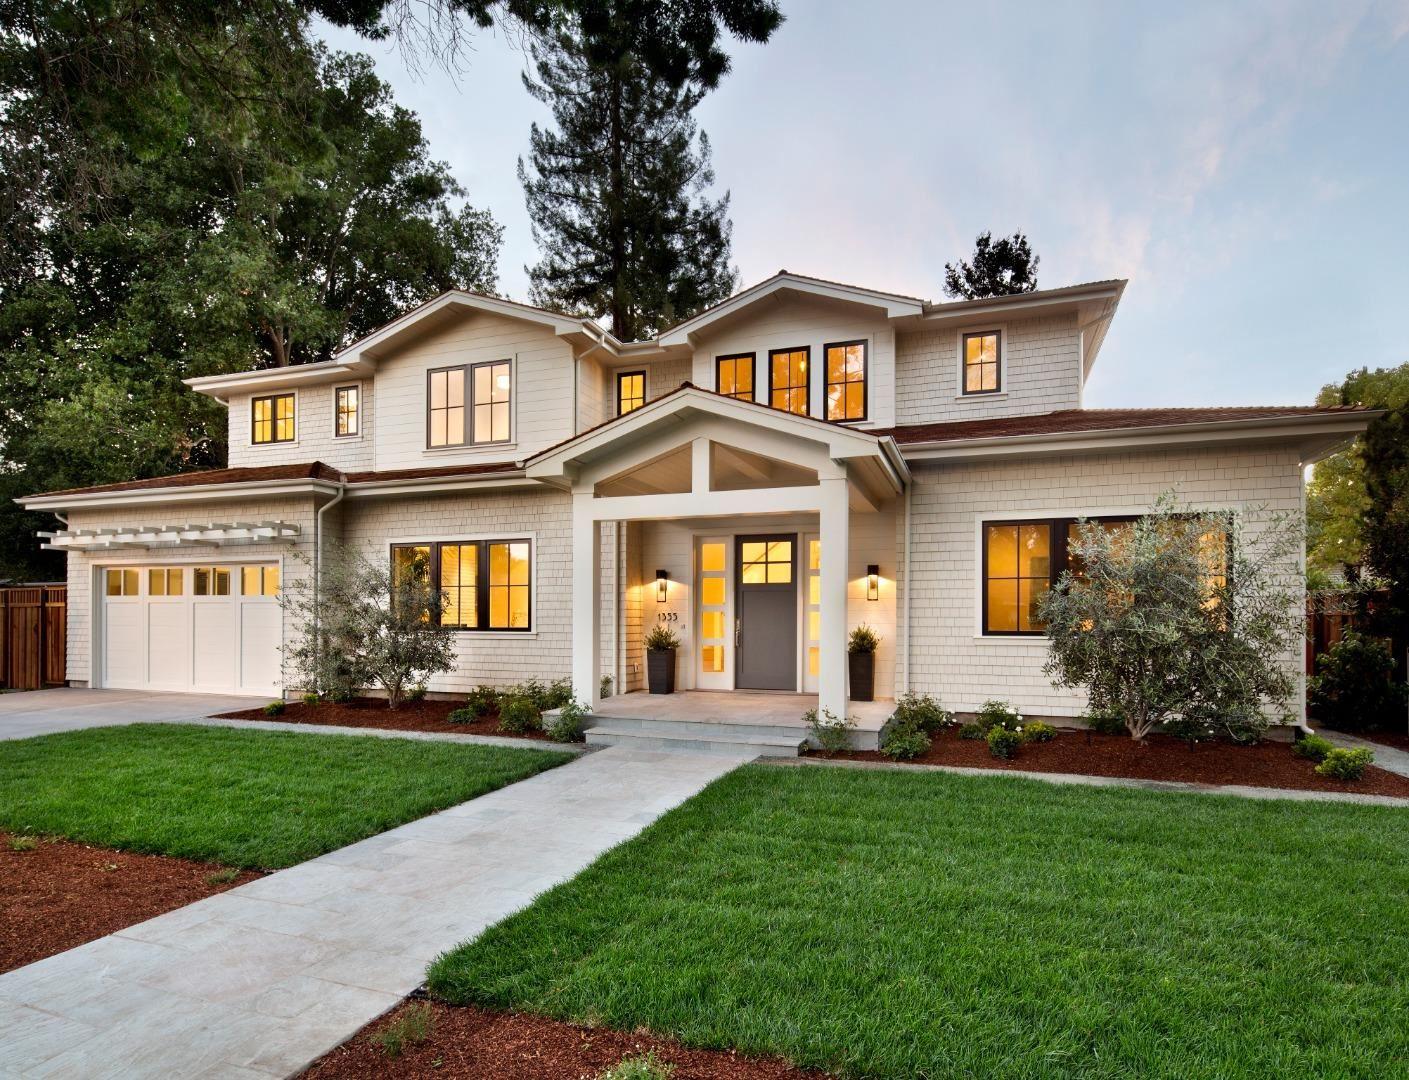 1355 Hillview Drive, Menlo Park, CA 94025 - #: ML81838757